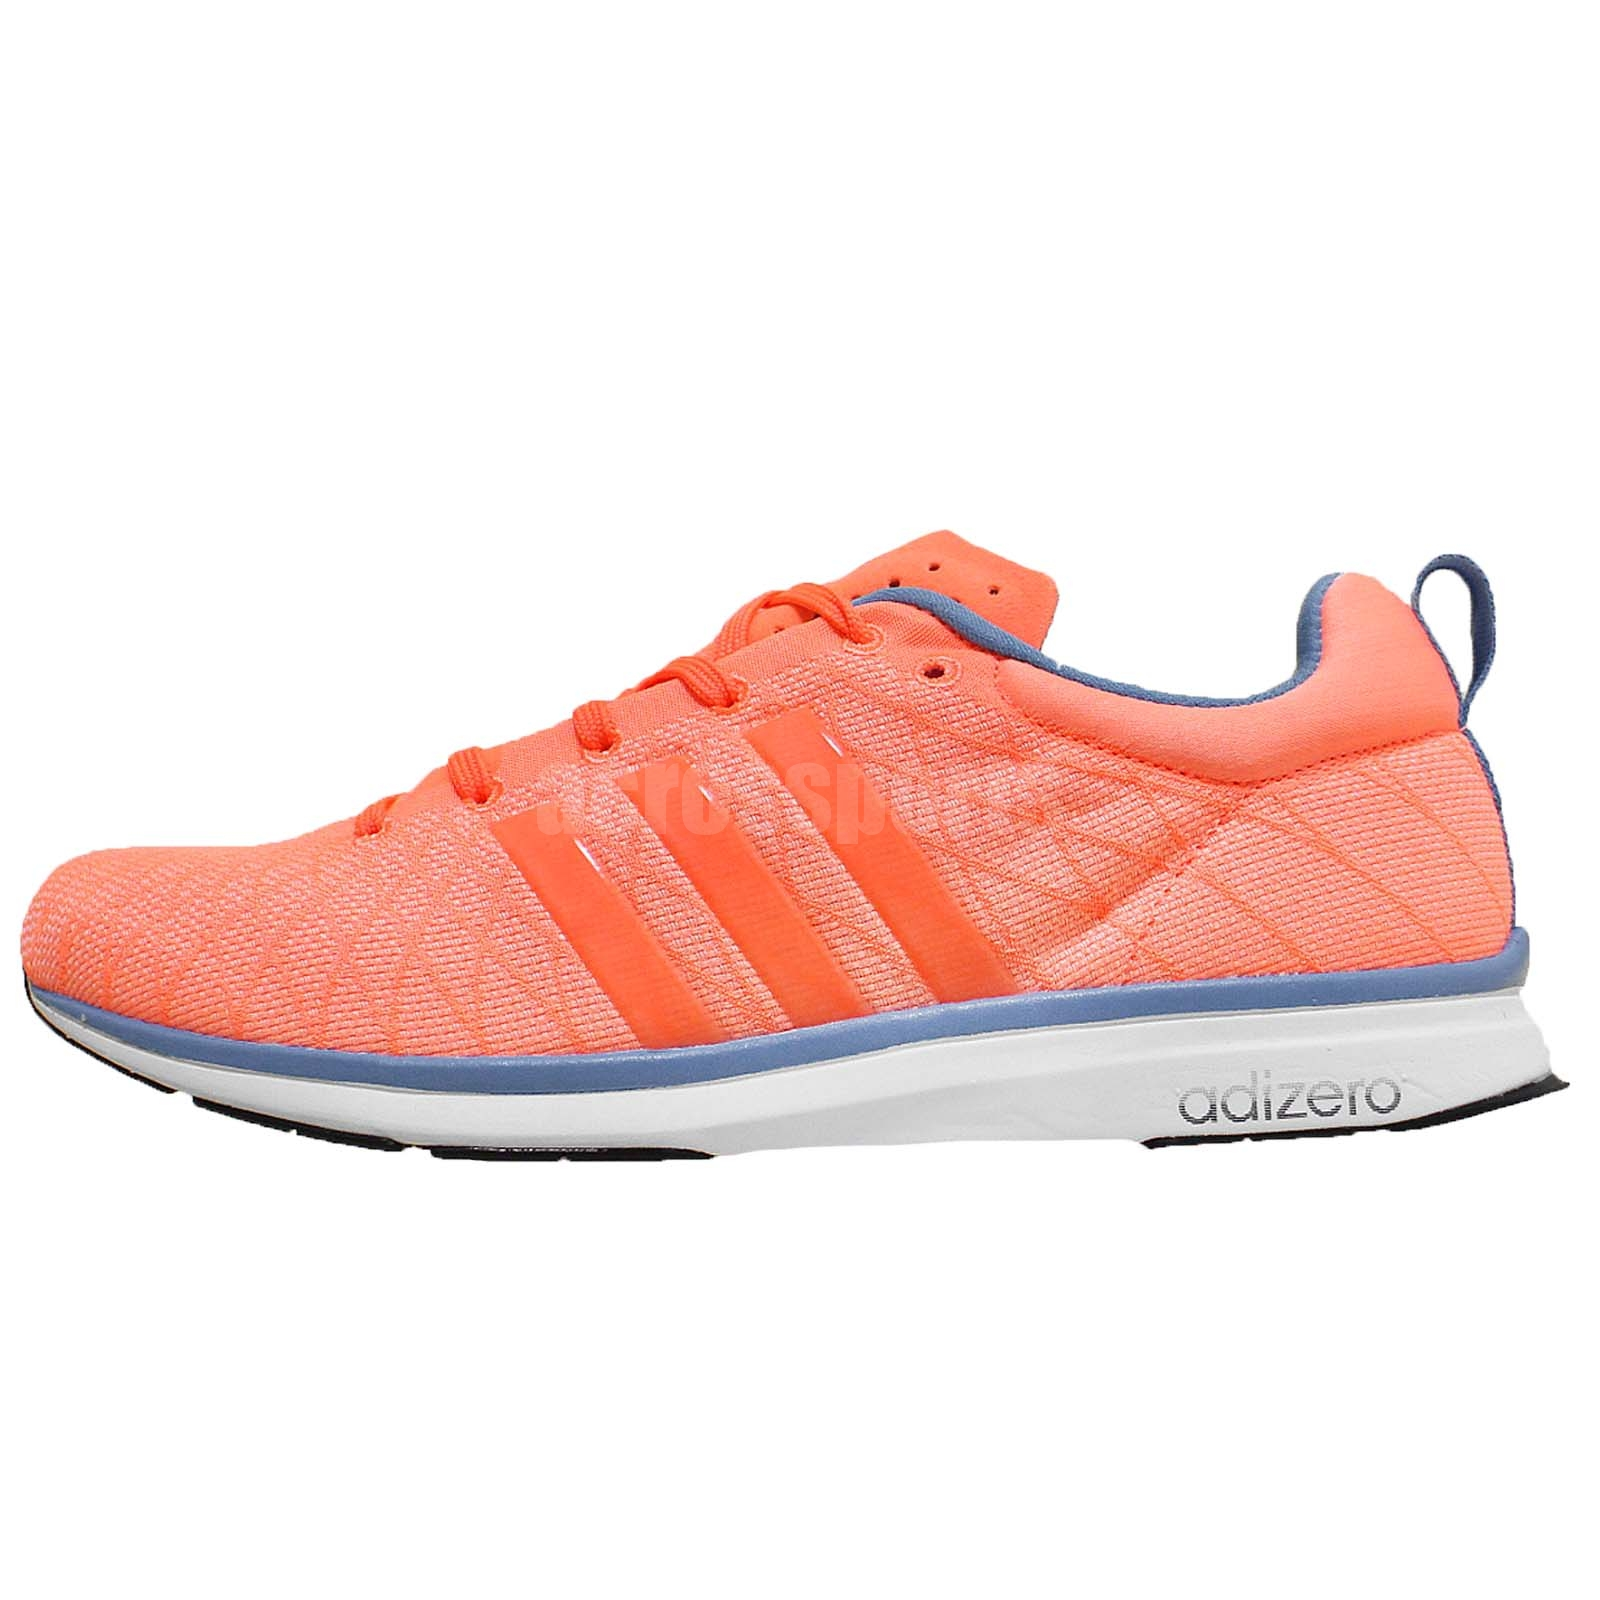 adidas adizero feather 4 w orange blue womens running